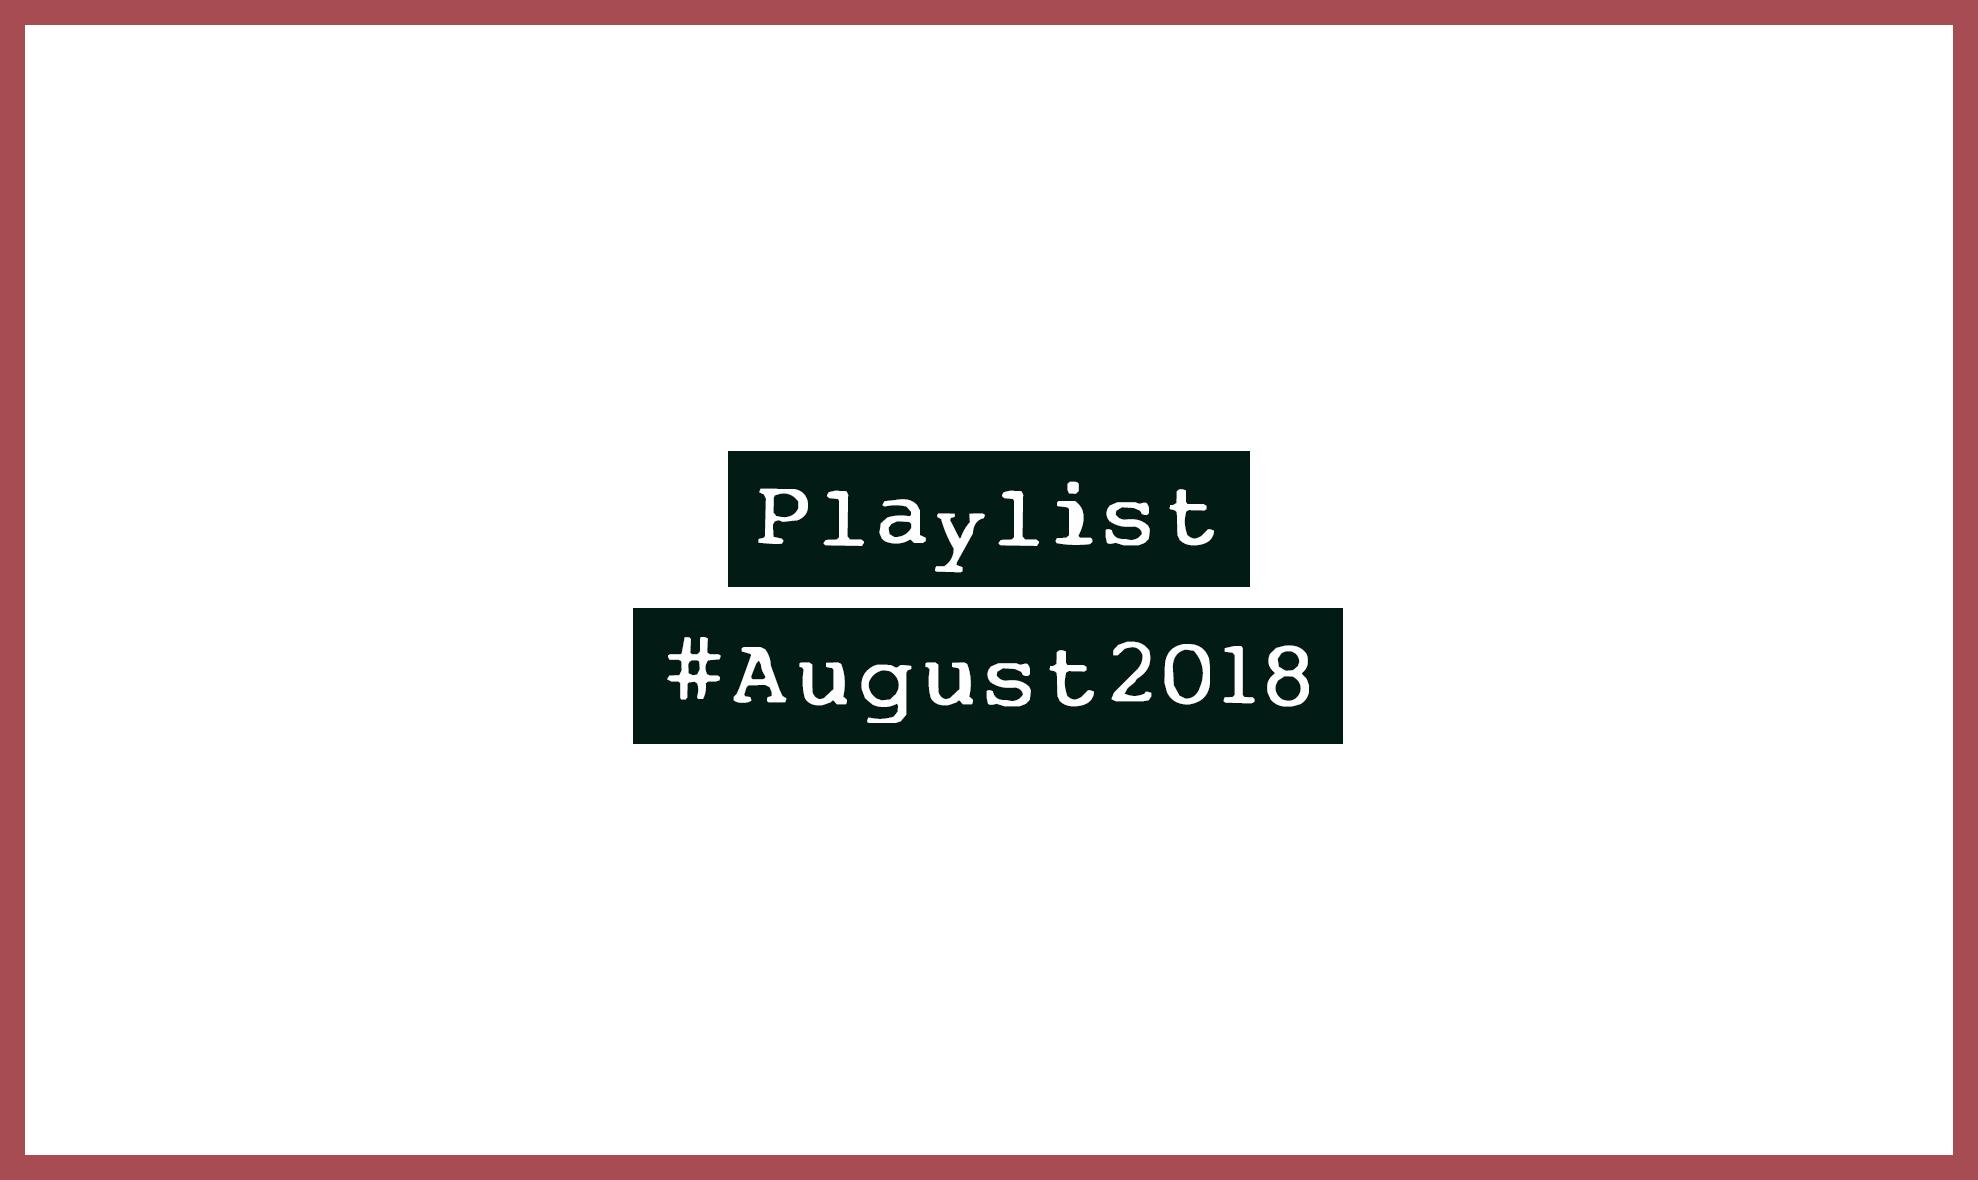 Playlist #August2018